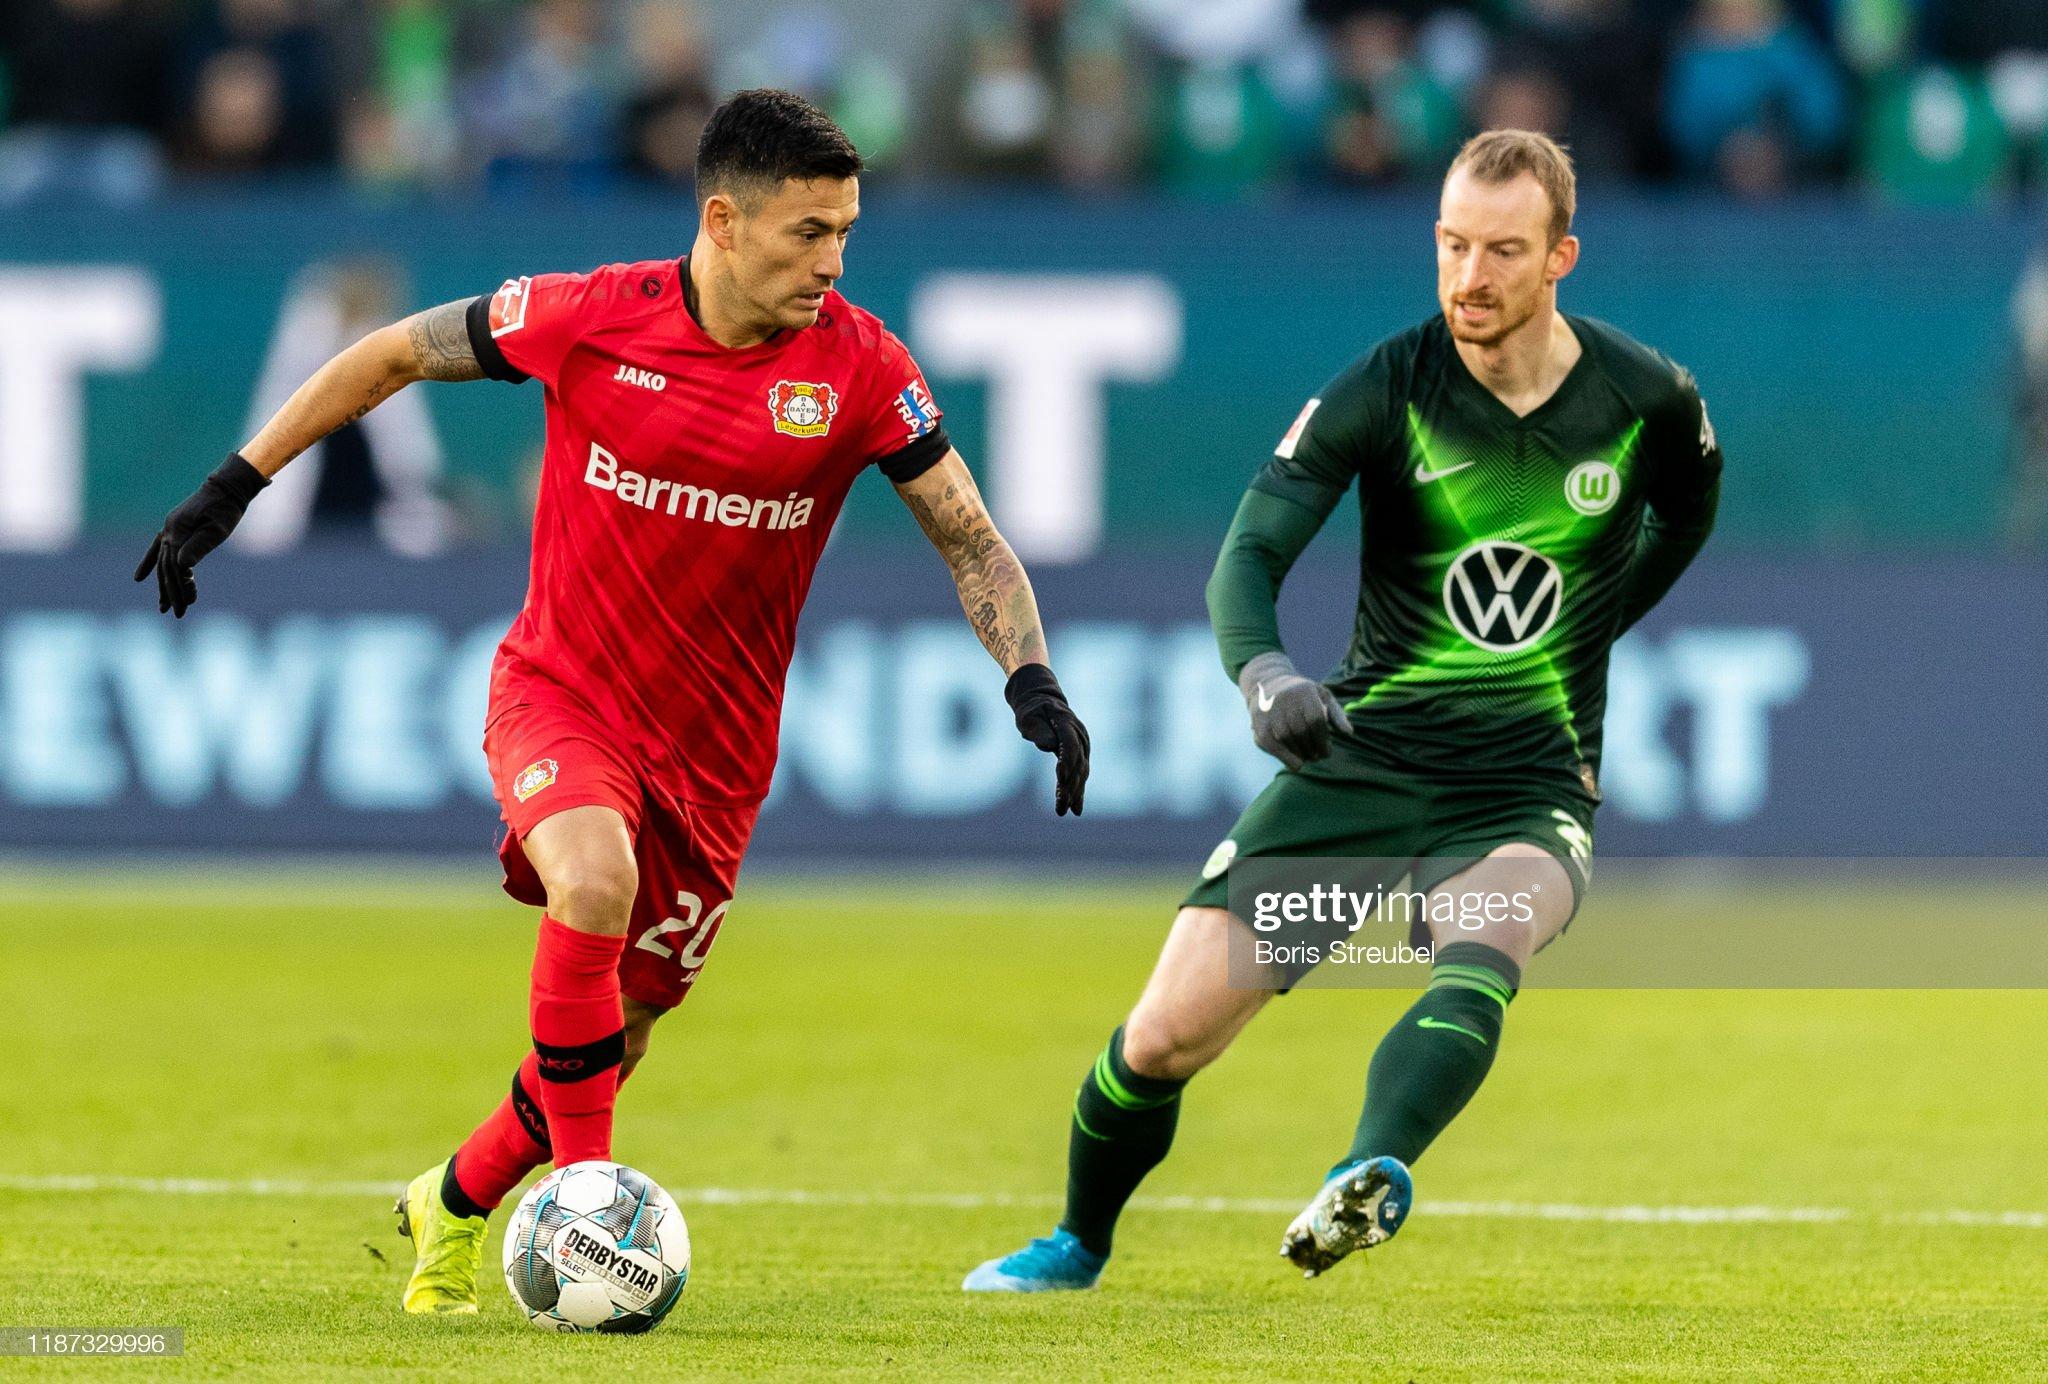 Bayer Leverkusen v Wolfsburg Preview, prediction and odds